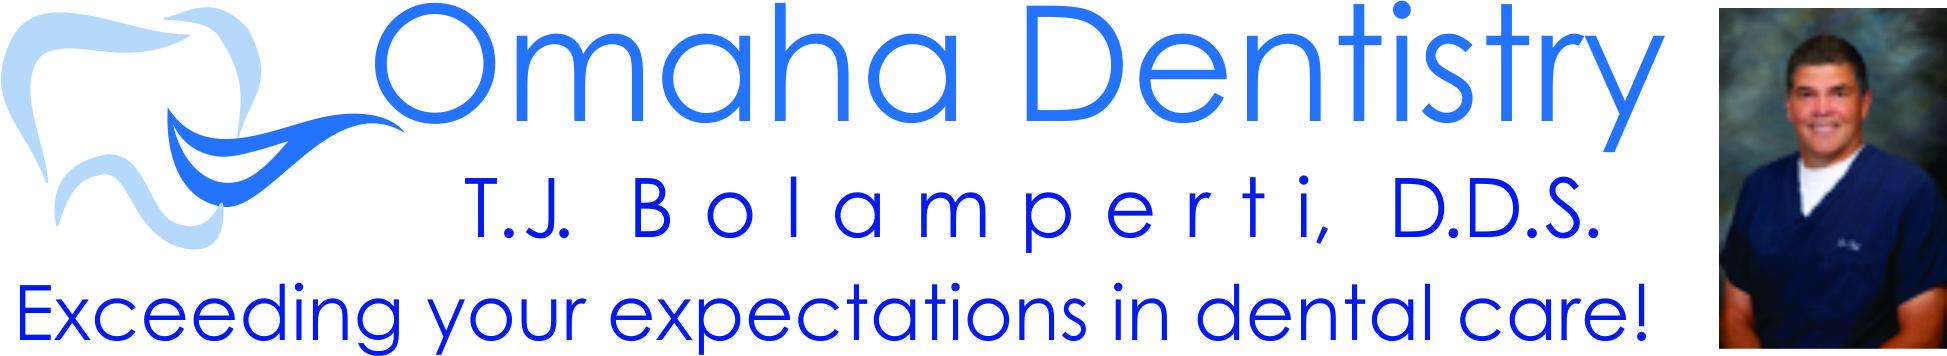 Omaha Dentistry Logo Large